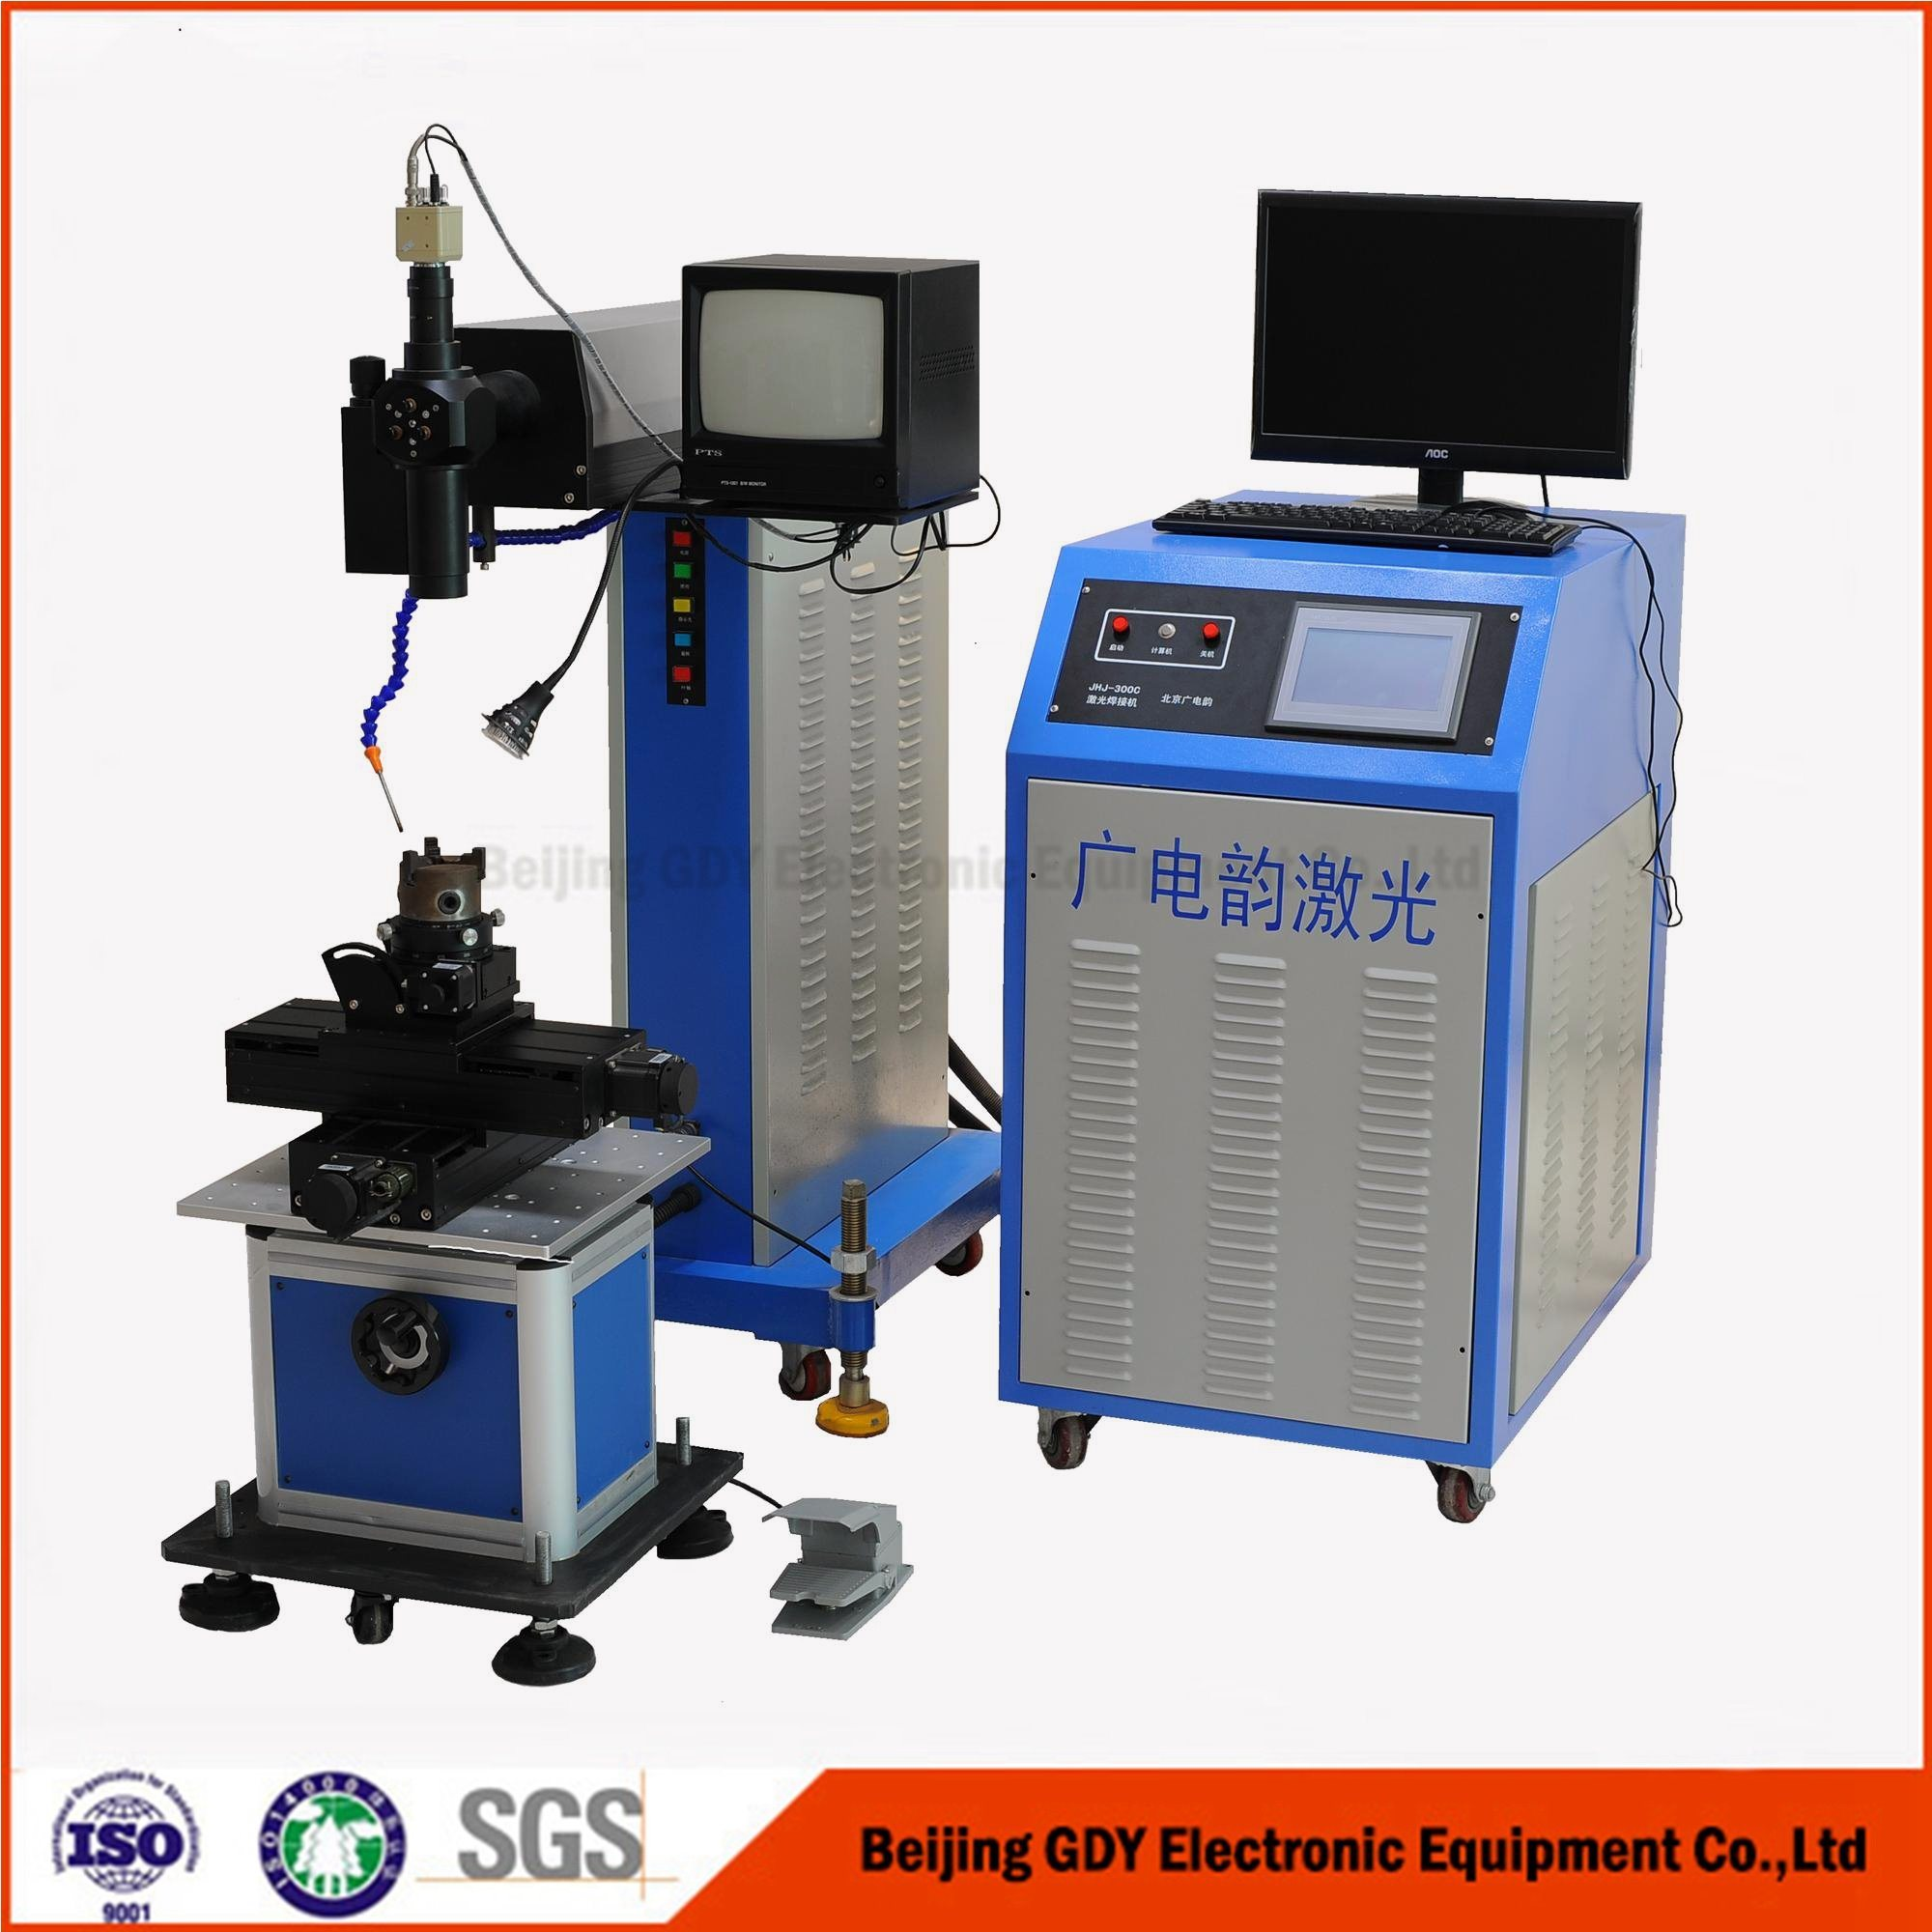 Precision Laser Welding Machine for Hardware